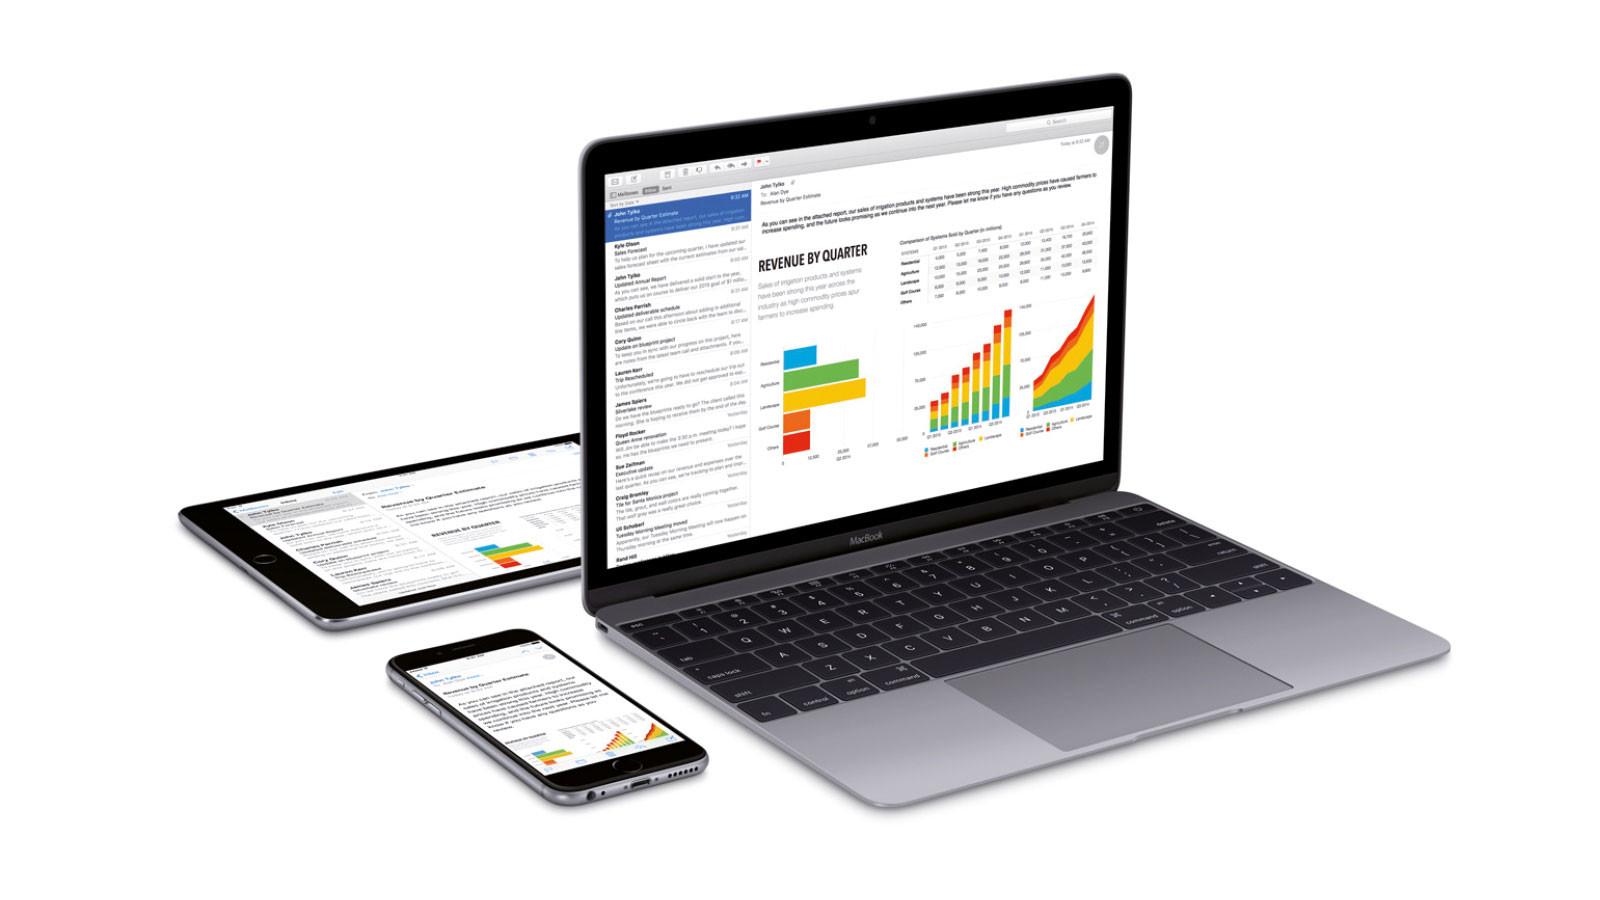 Proyect Marzipan iPhone iPad Mac